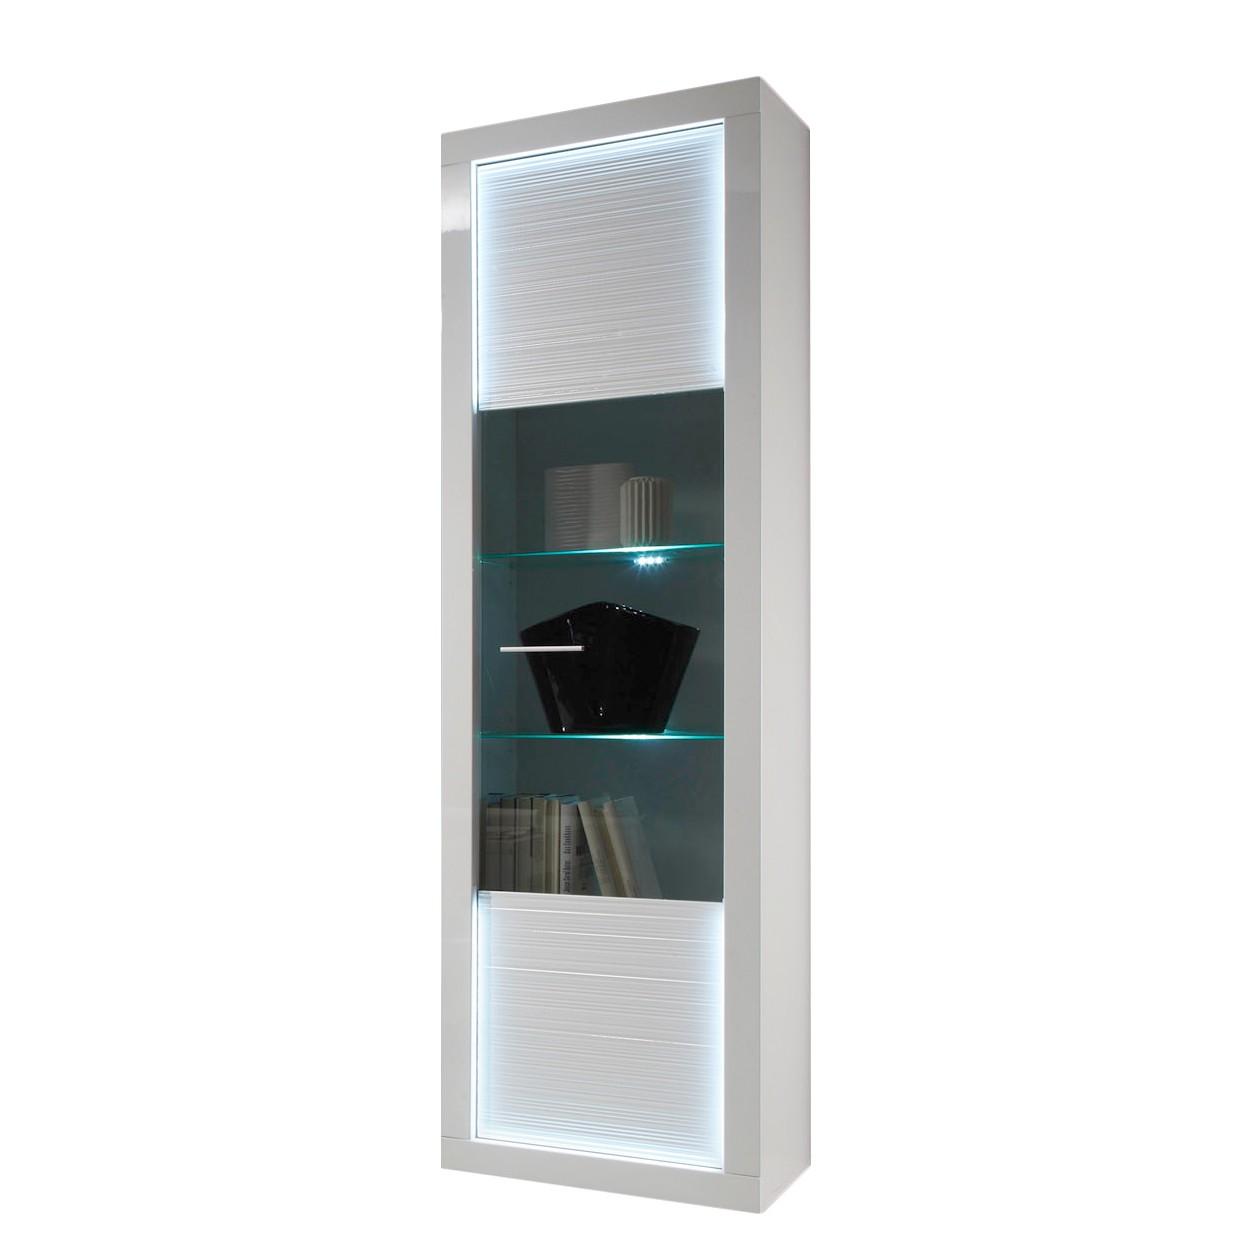 energie  A+, Staande vitrinekast Tolanaro II (inclusief verlichting) - hoogglans wit/wit, Trendteam